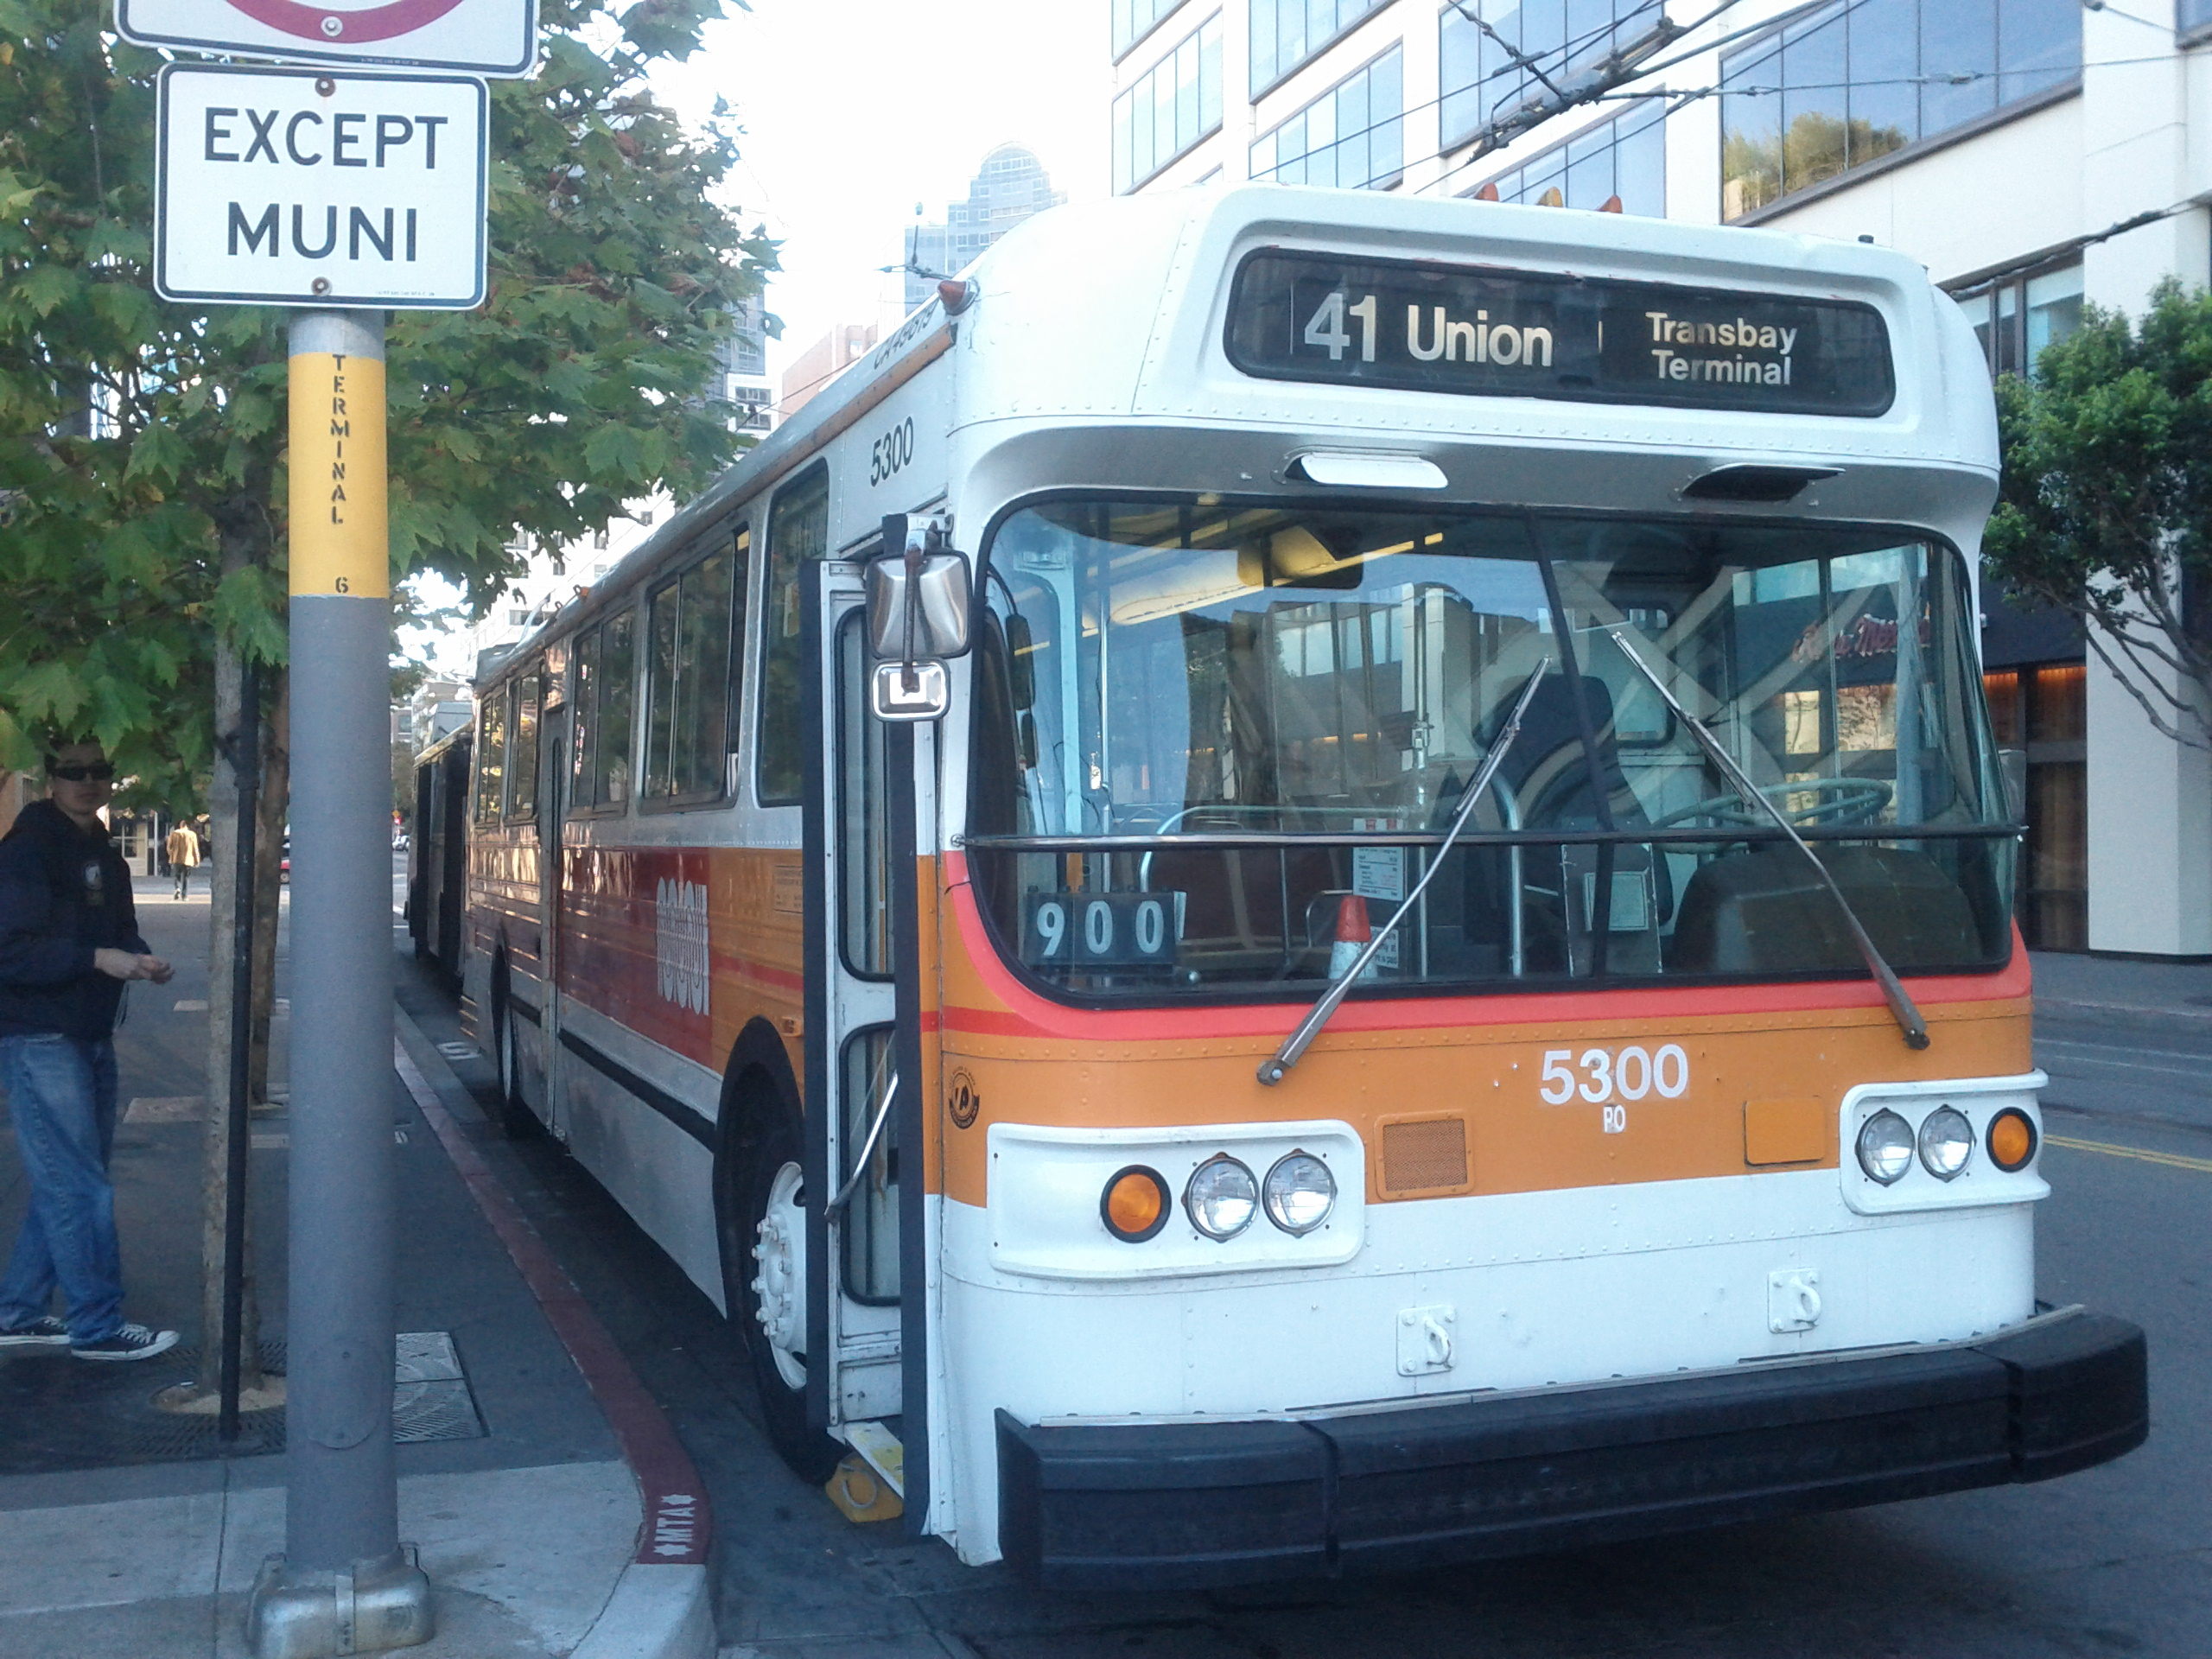 Muni Trolleys San Francisco File:san Francisco Muni Flyer